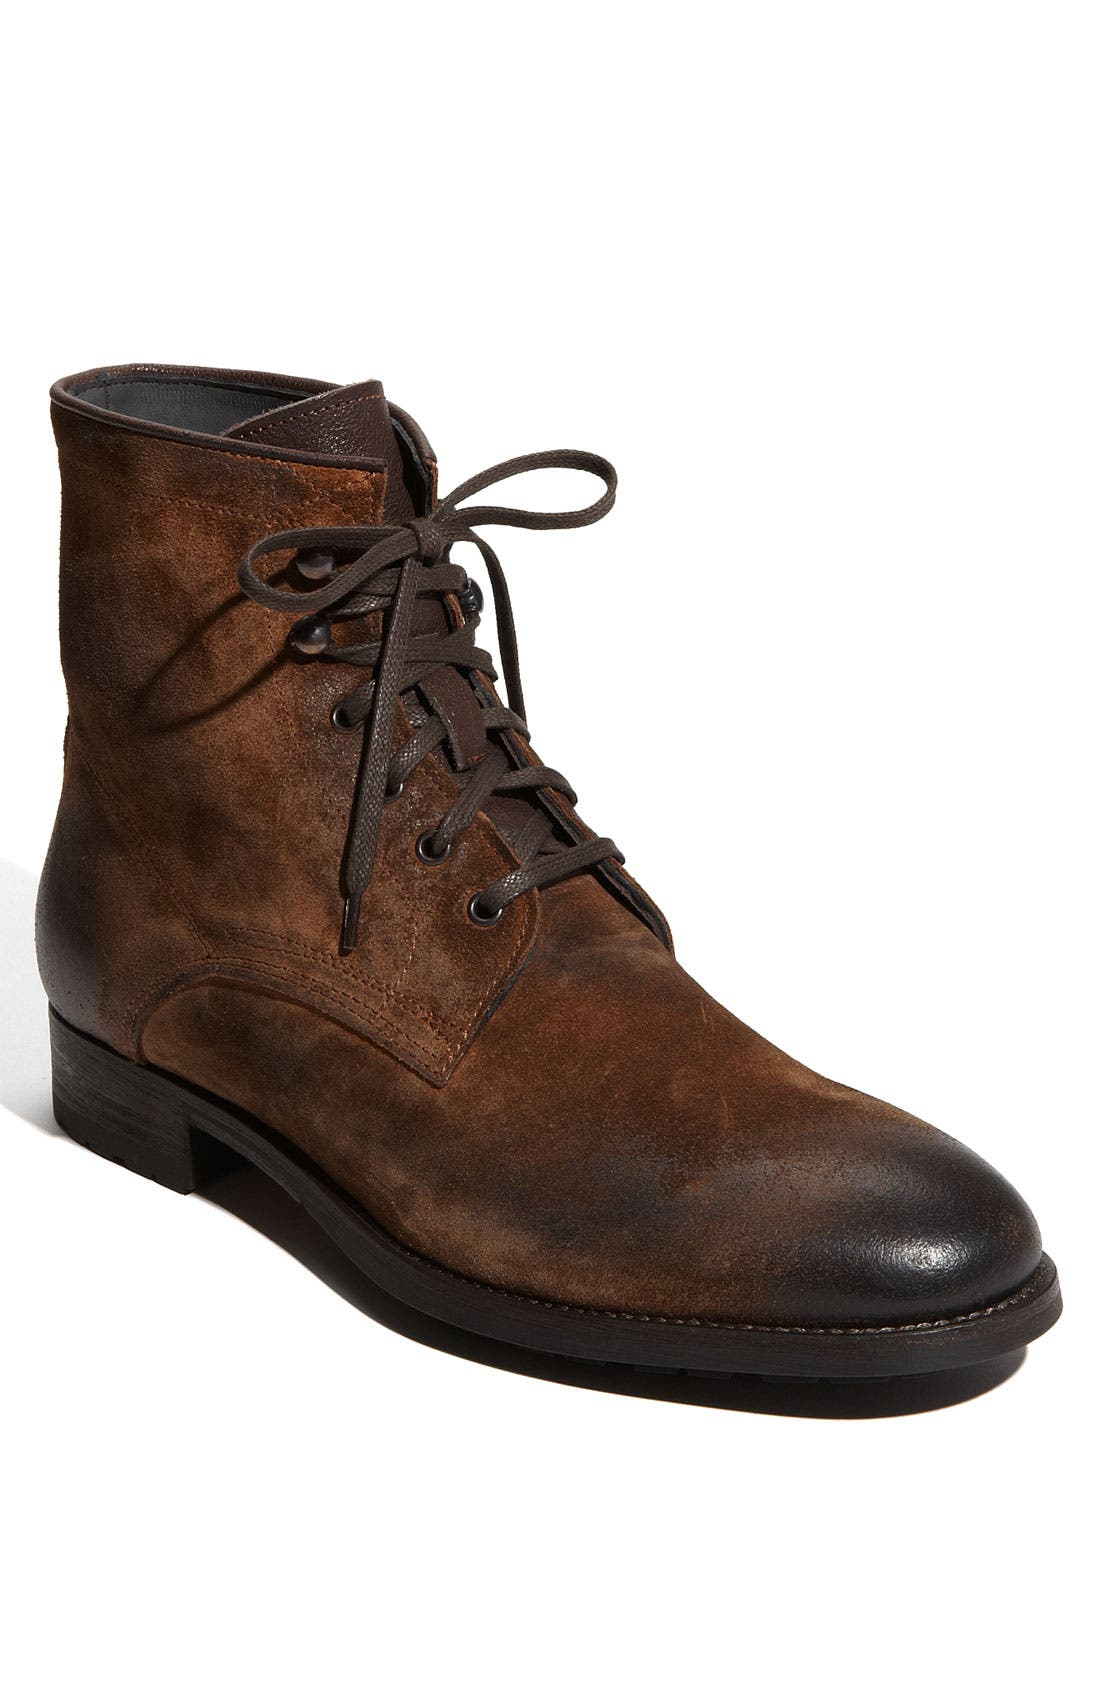 Alternate Image 1 Selected - To Boot New York 'Kilburn' Boot